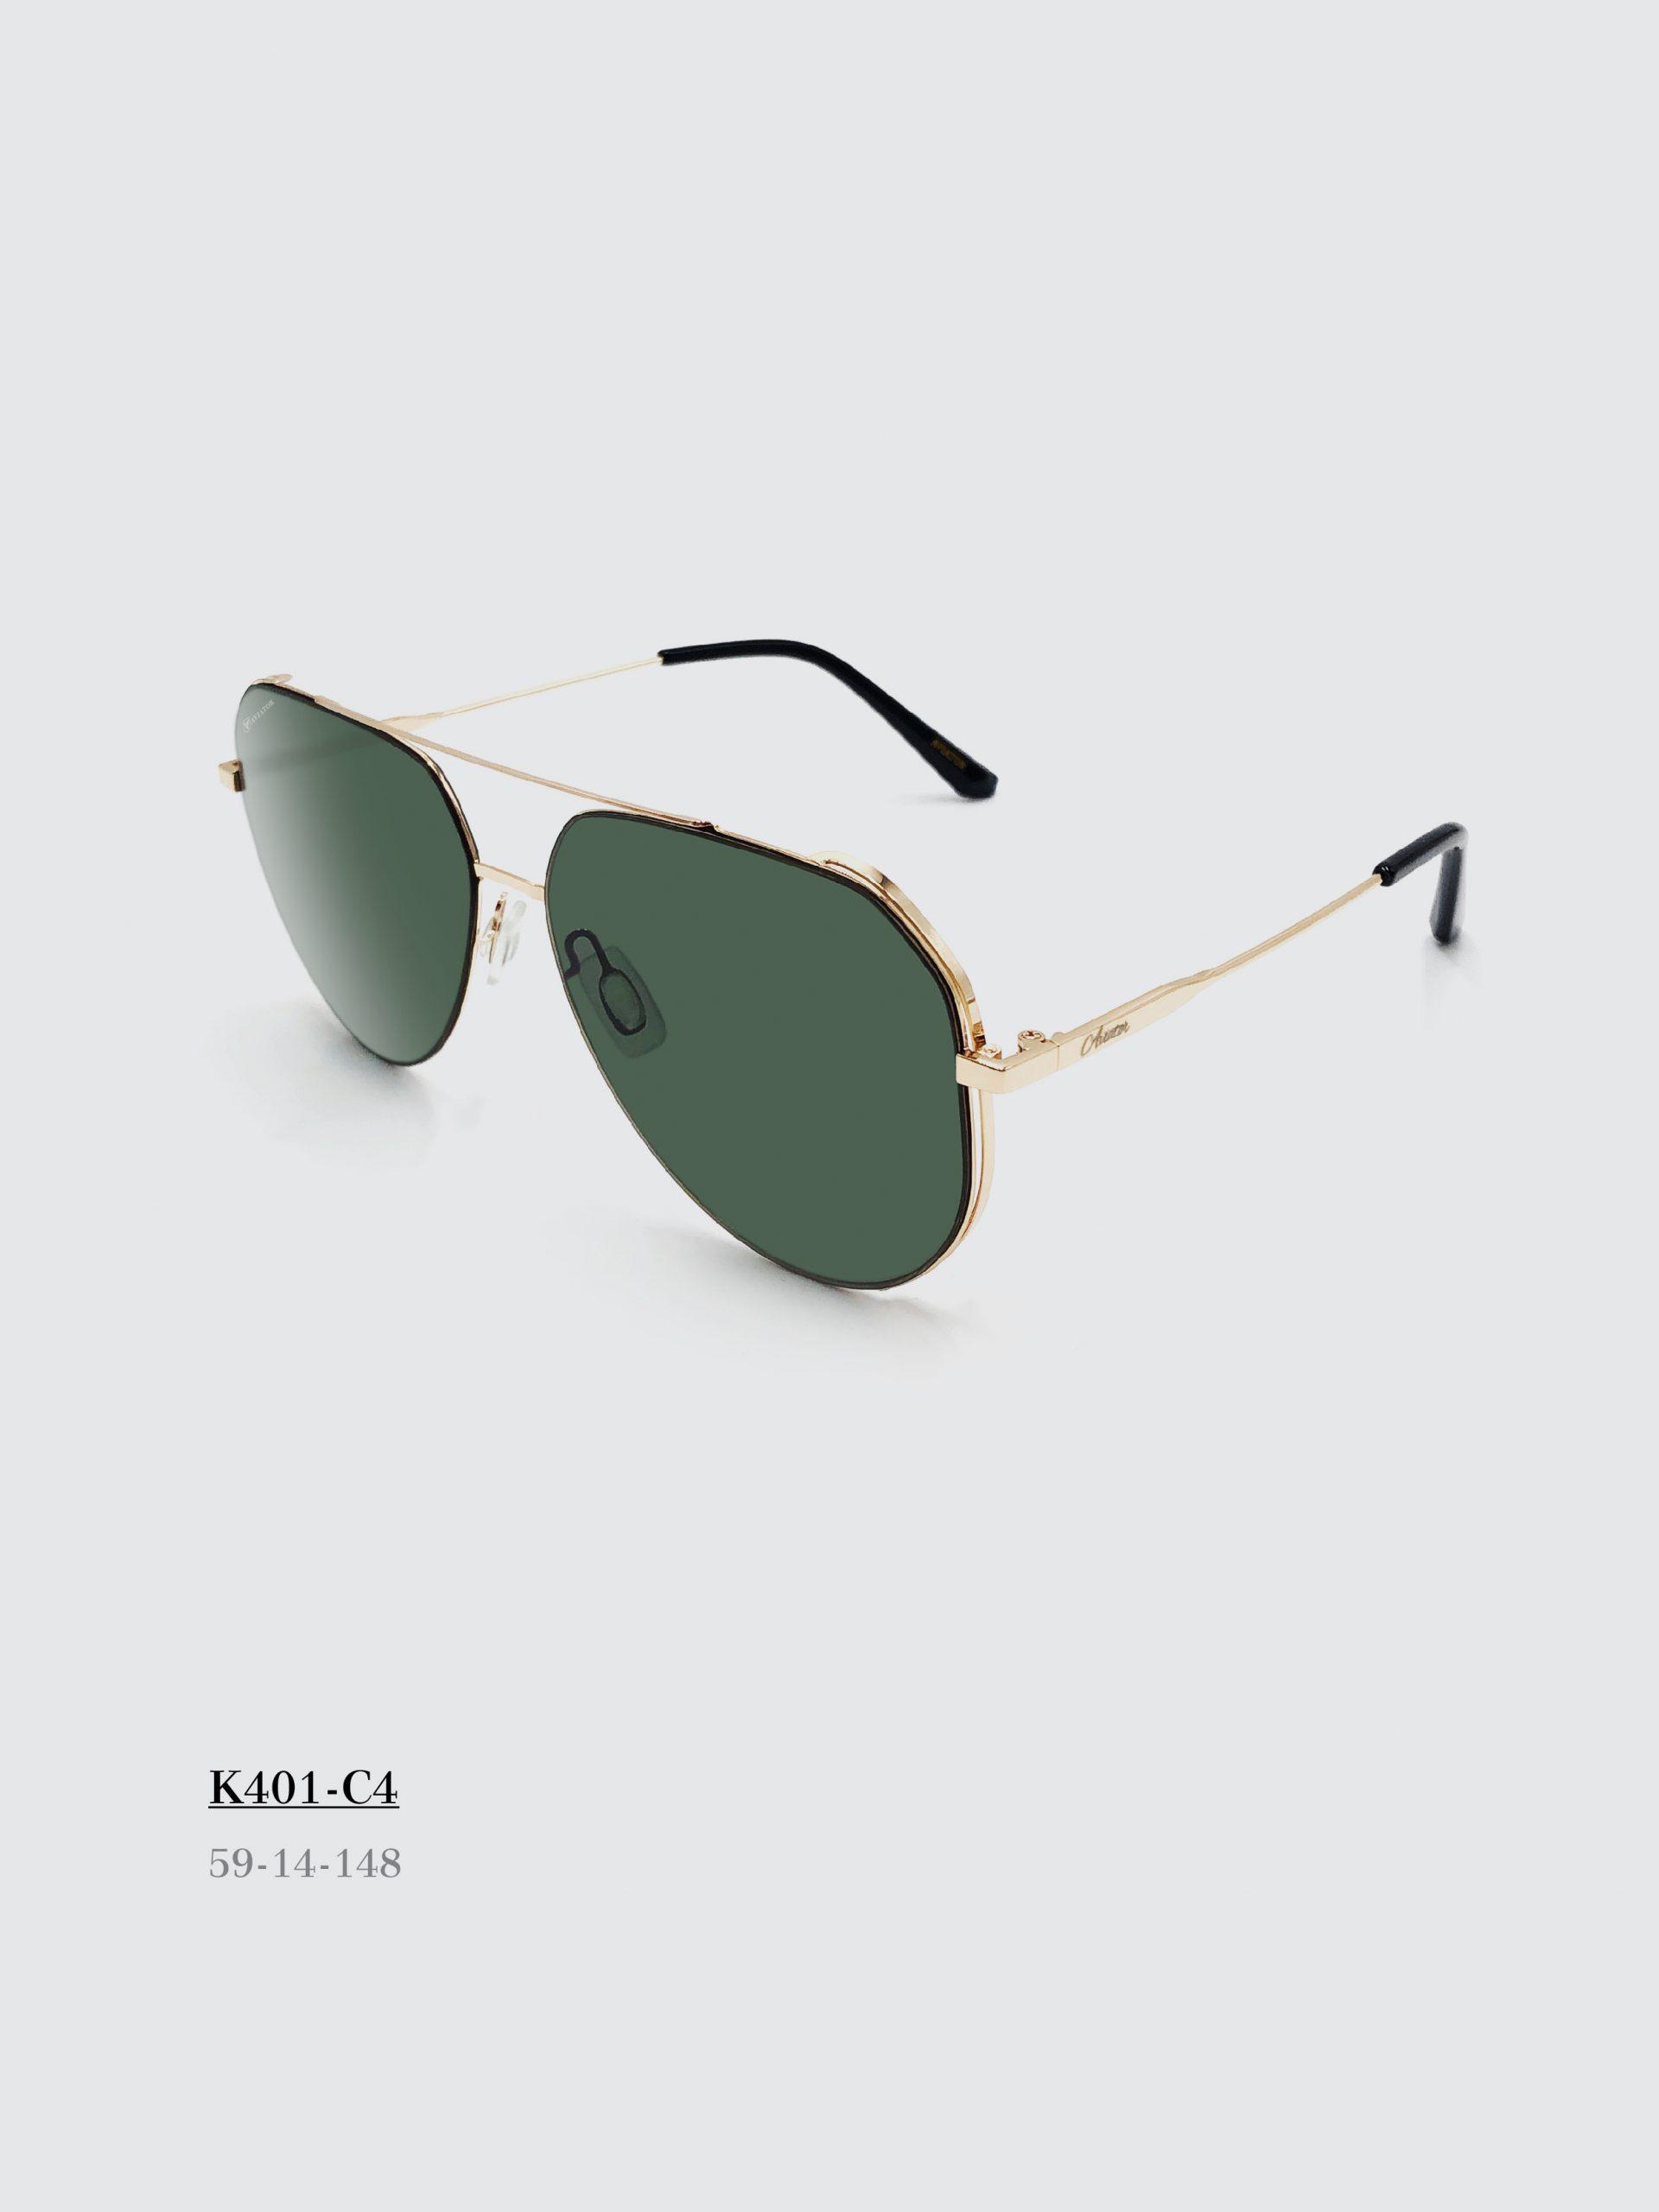 K401-C4